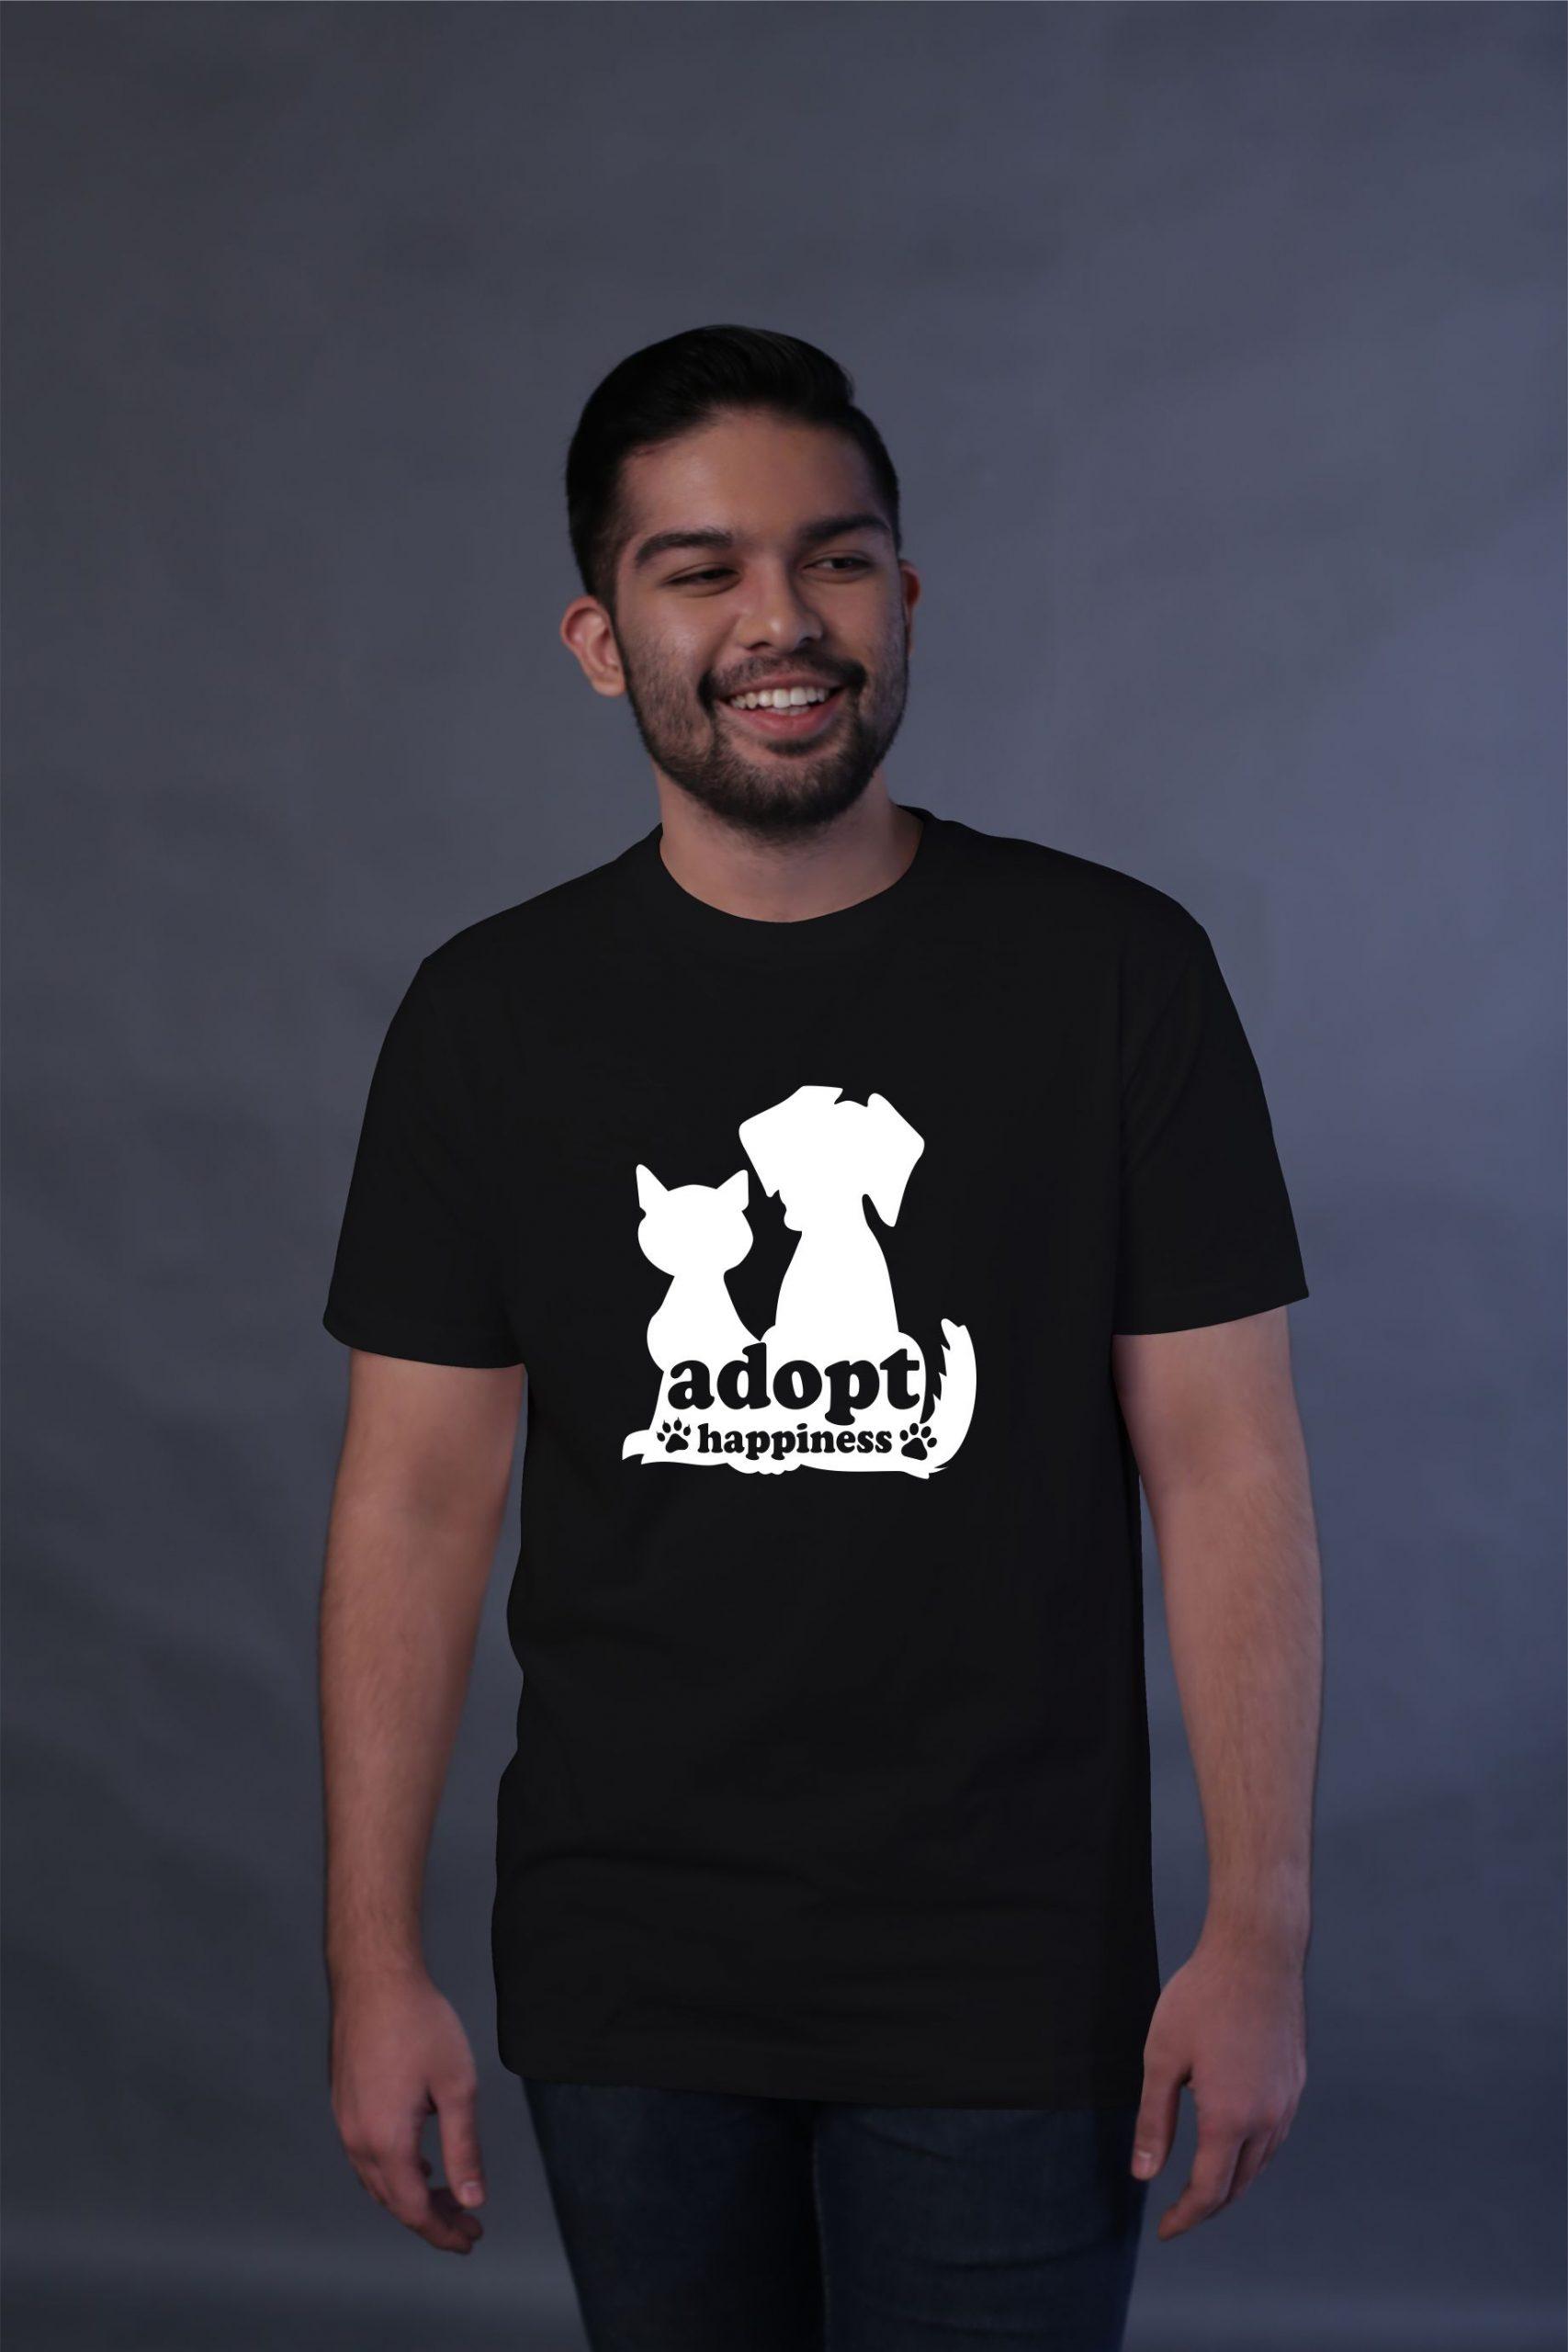 Adopt image 1